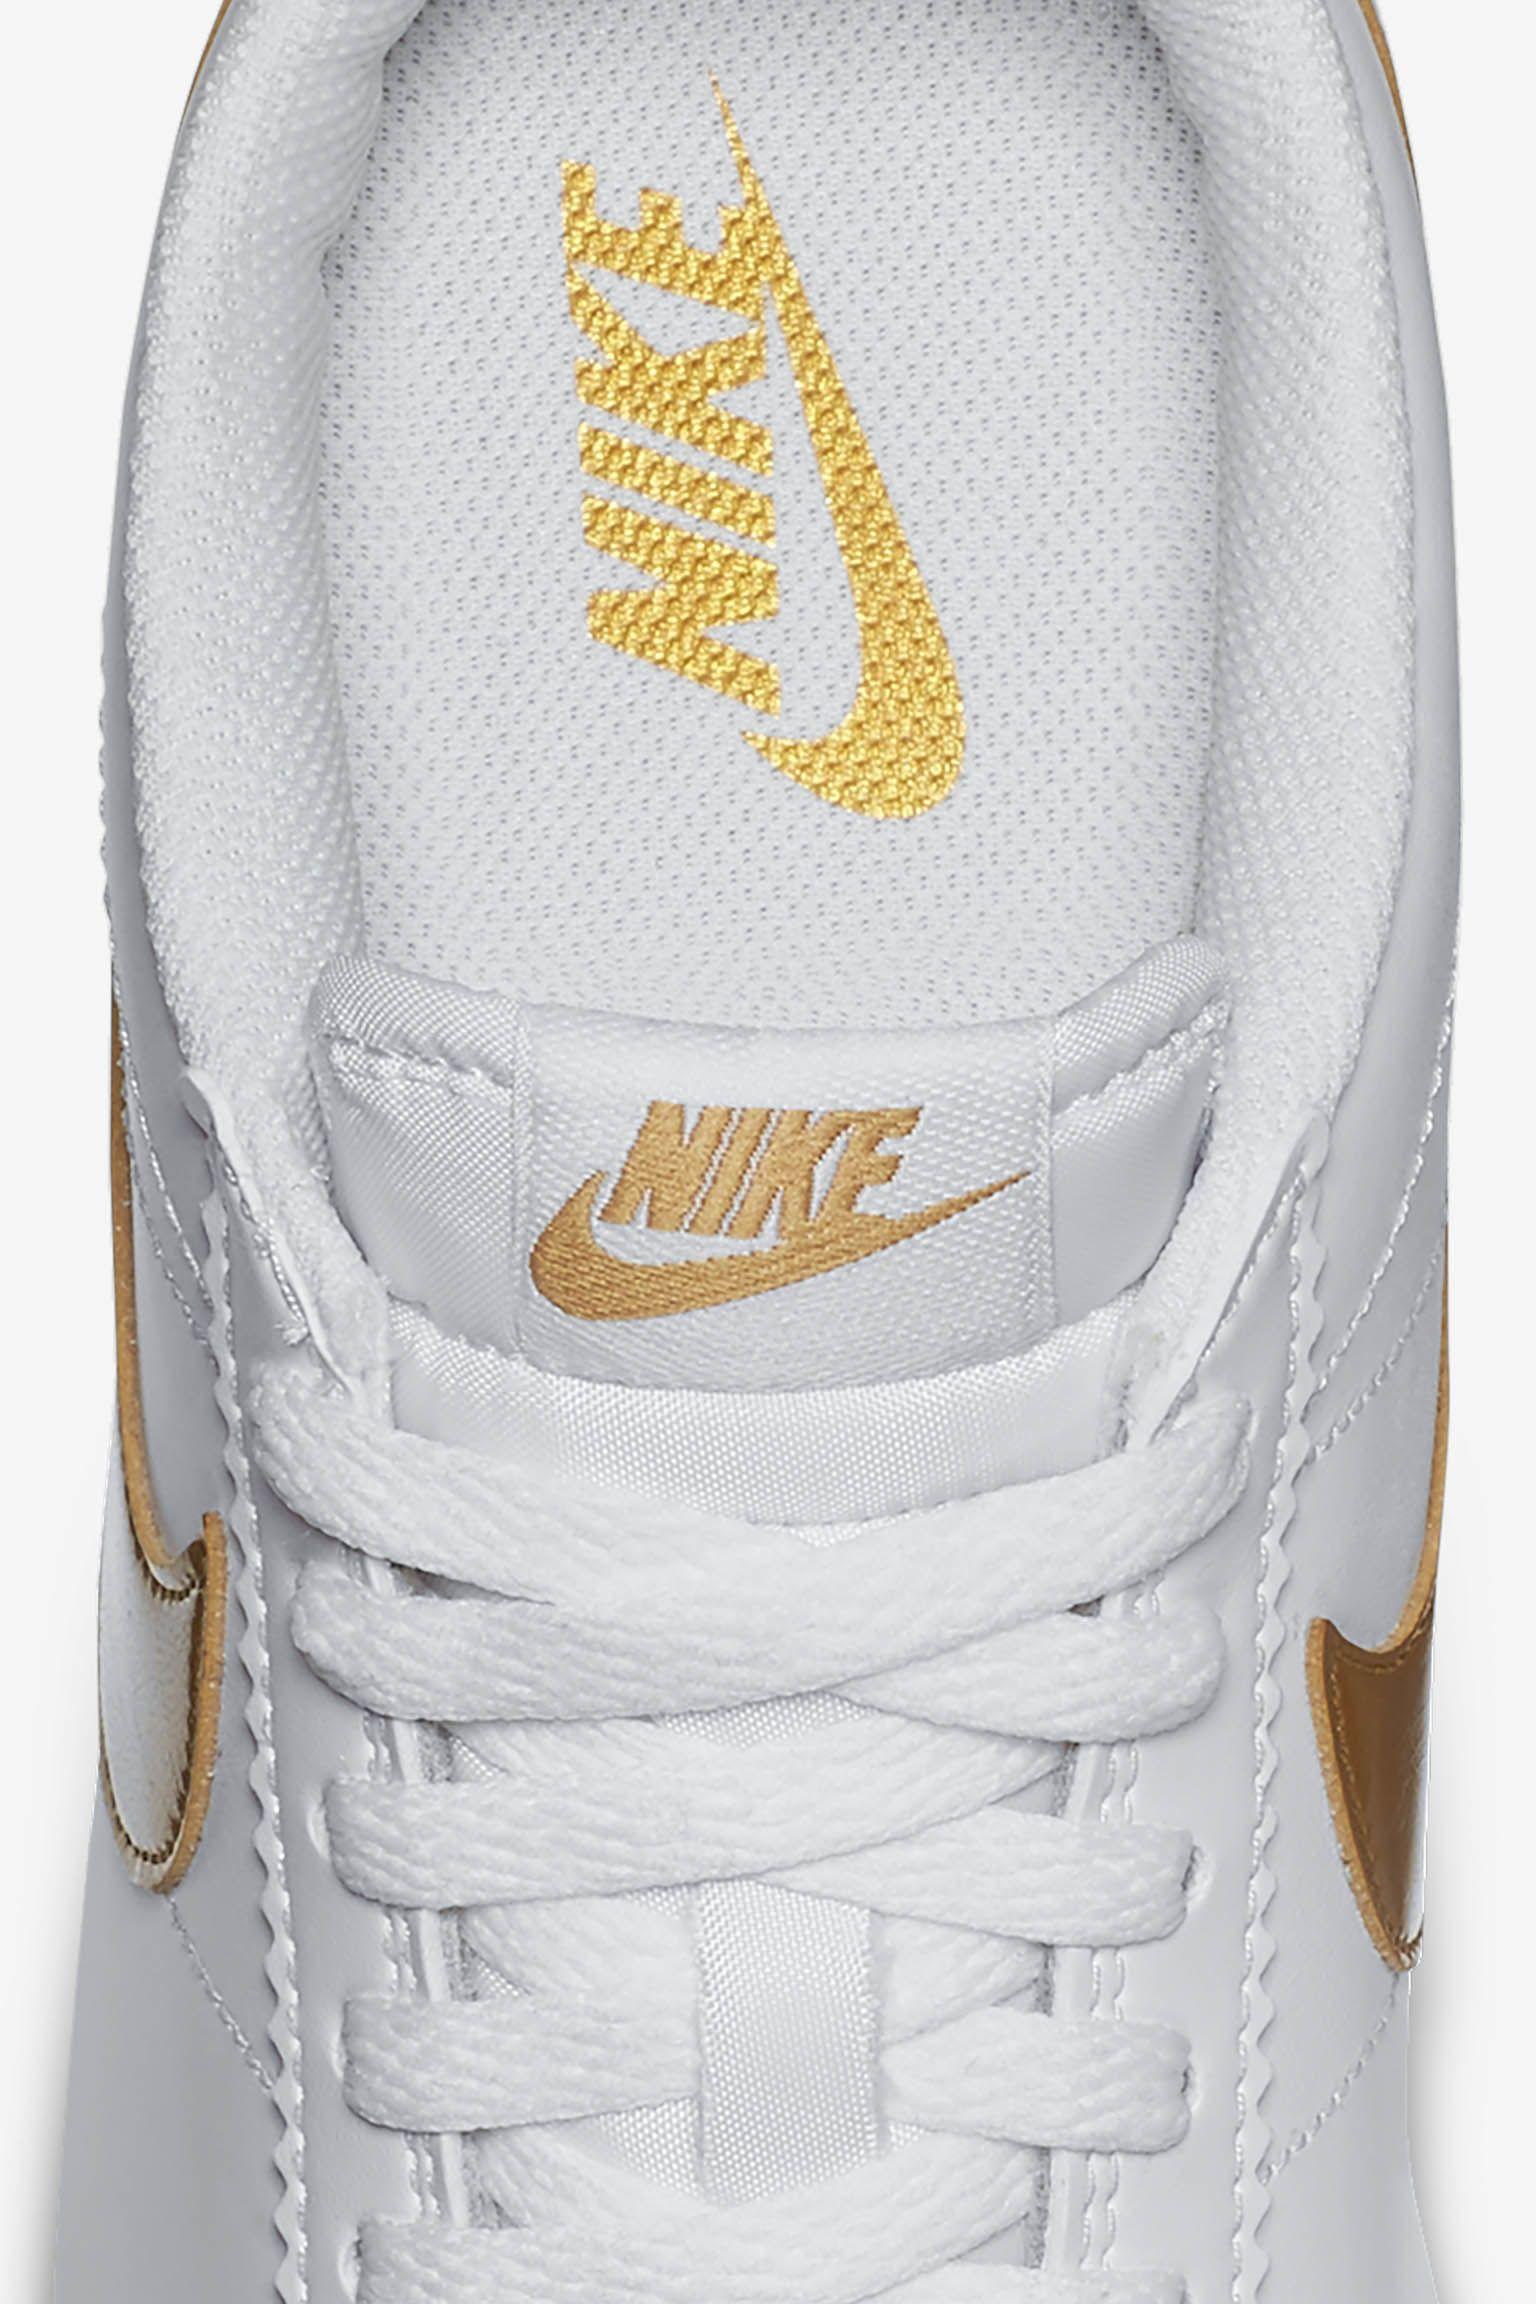 Women's Nike Classic Cortez 'White & Metallic Gold'